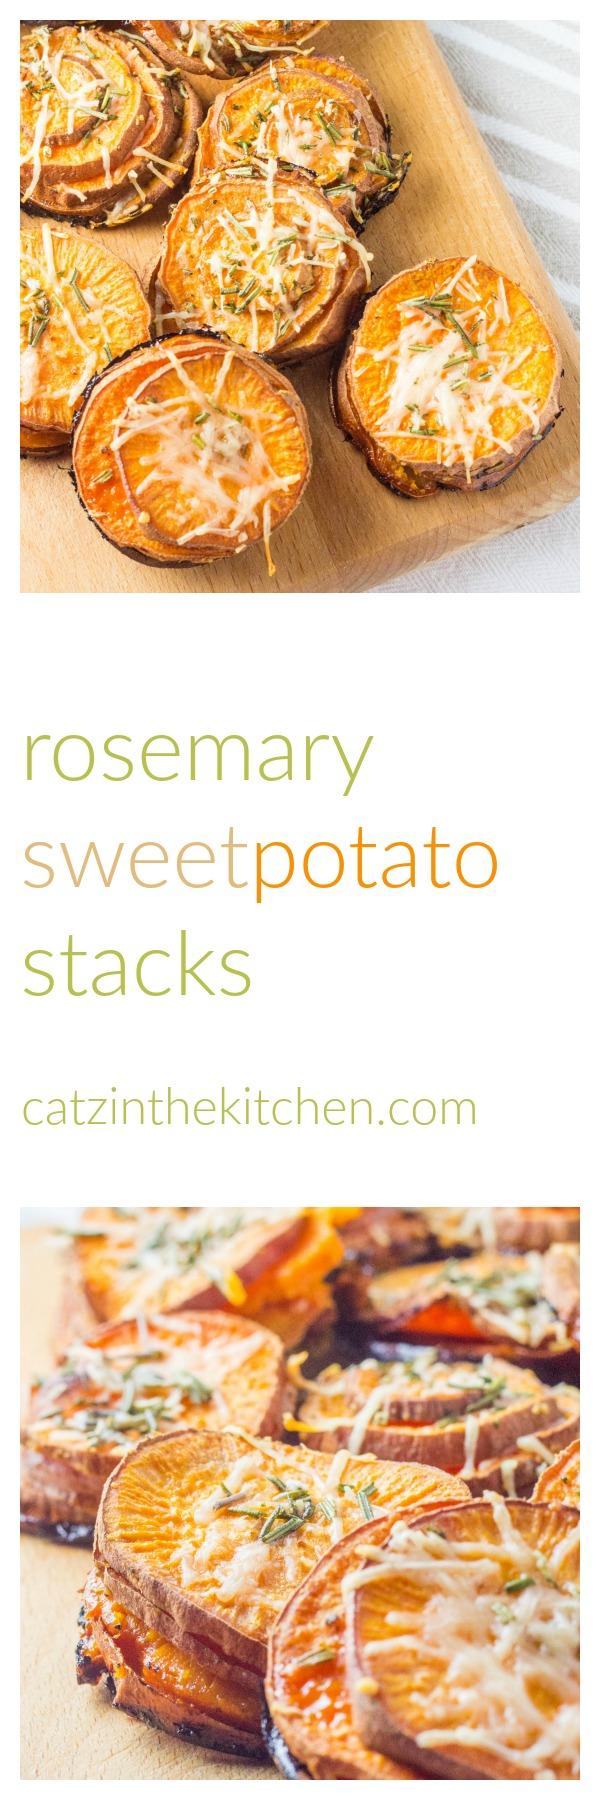 Rosemary Sweet Potato Stacks | Catz in the Kitchen | catzinthekitchen.com | #sweetpotatoes #rosemary #recipe